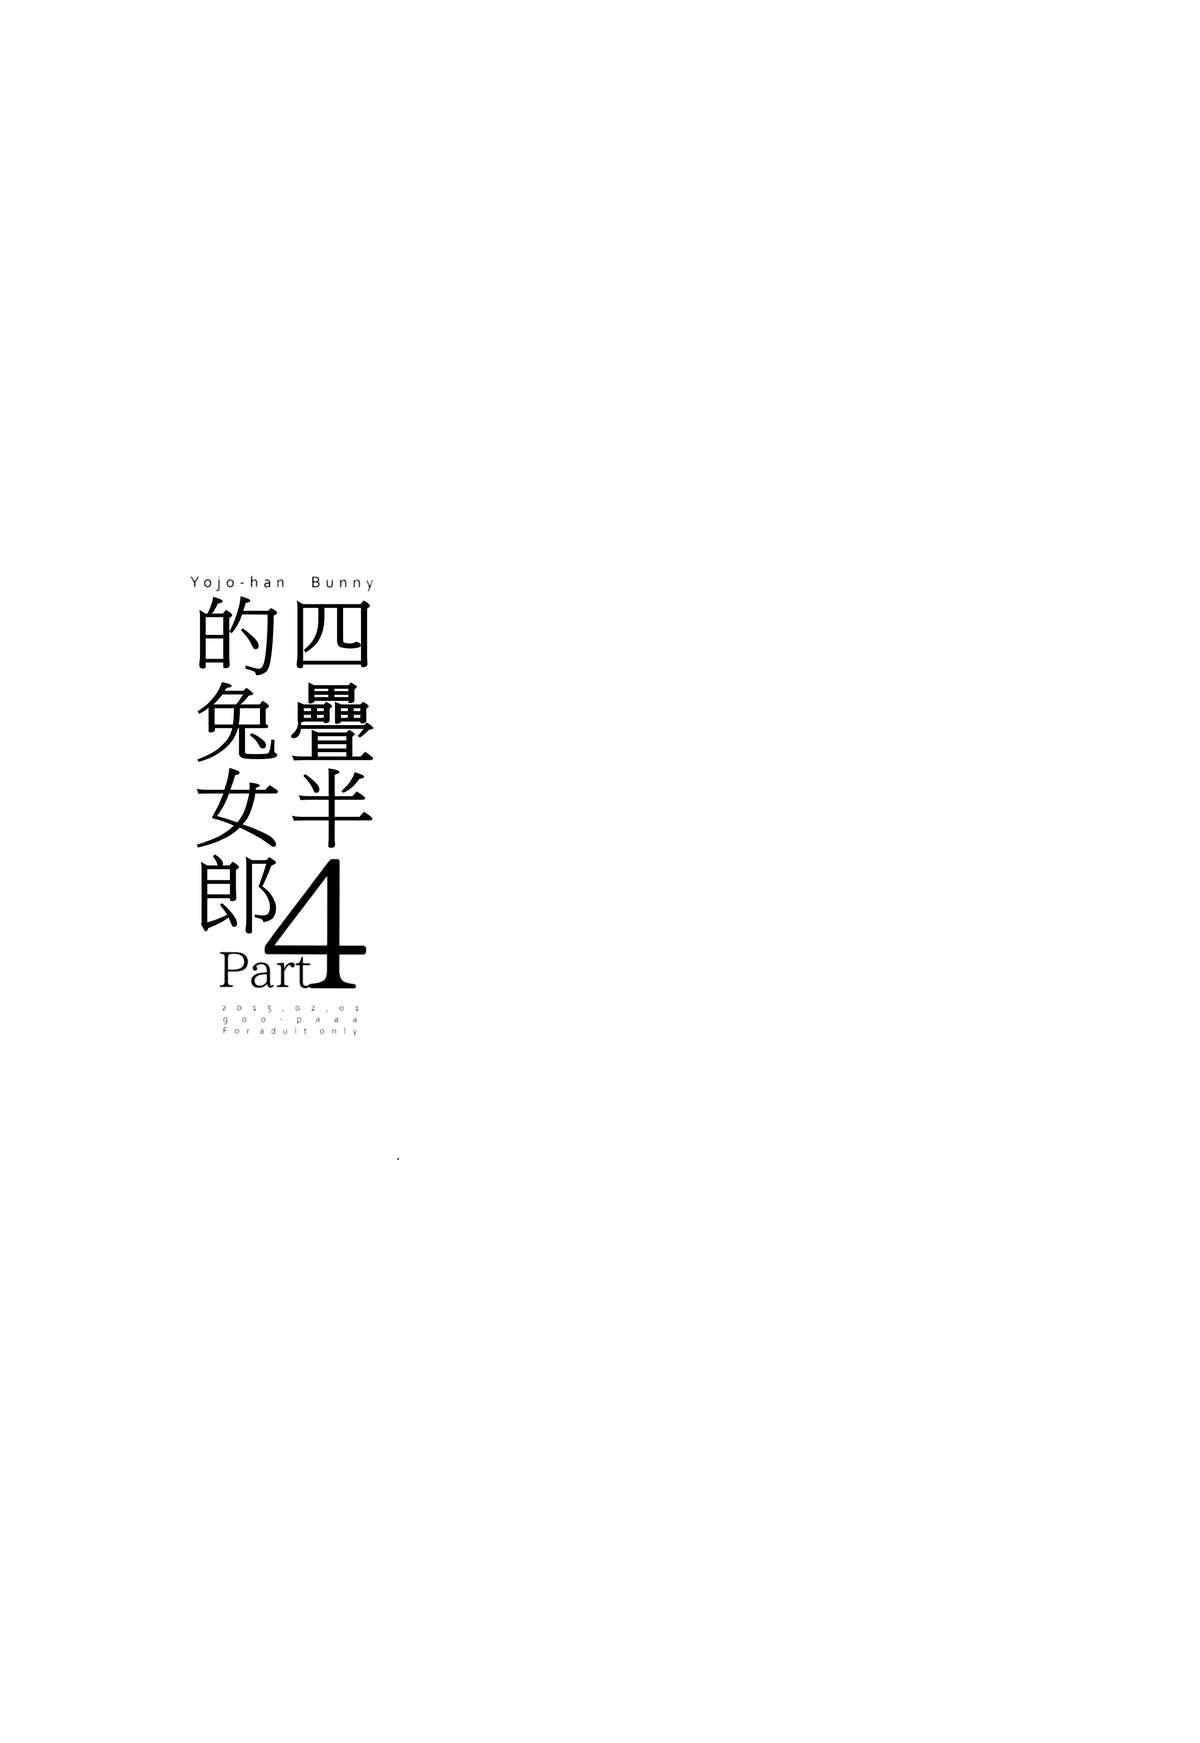 Yojo-han Bunny Part 4 2